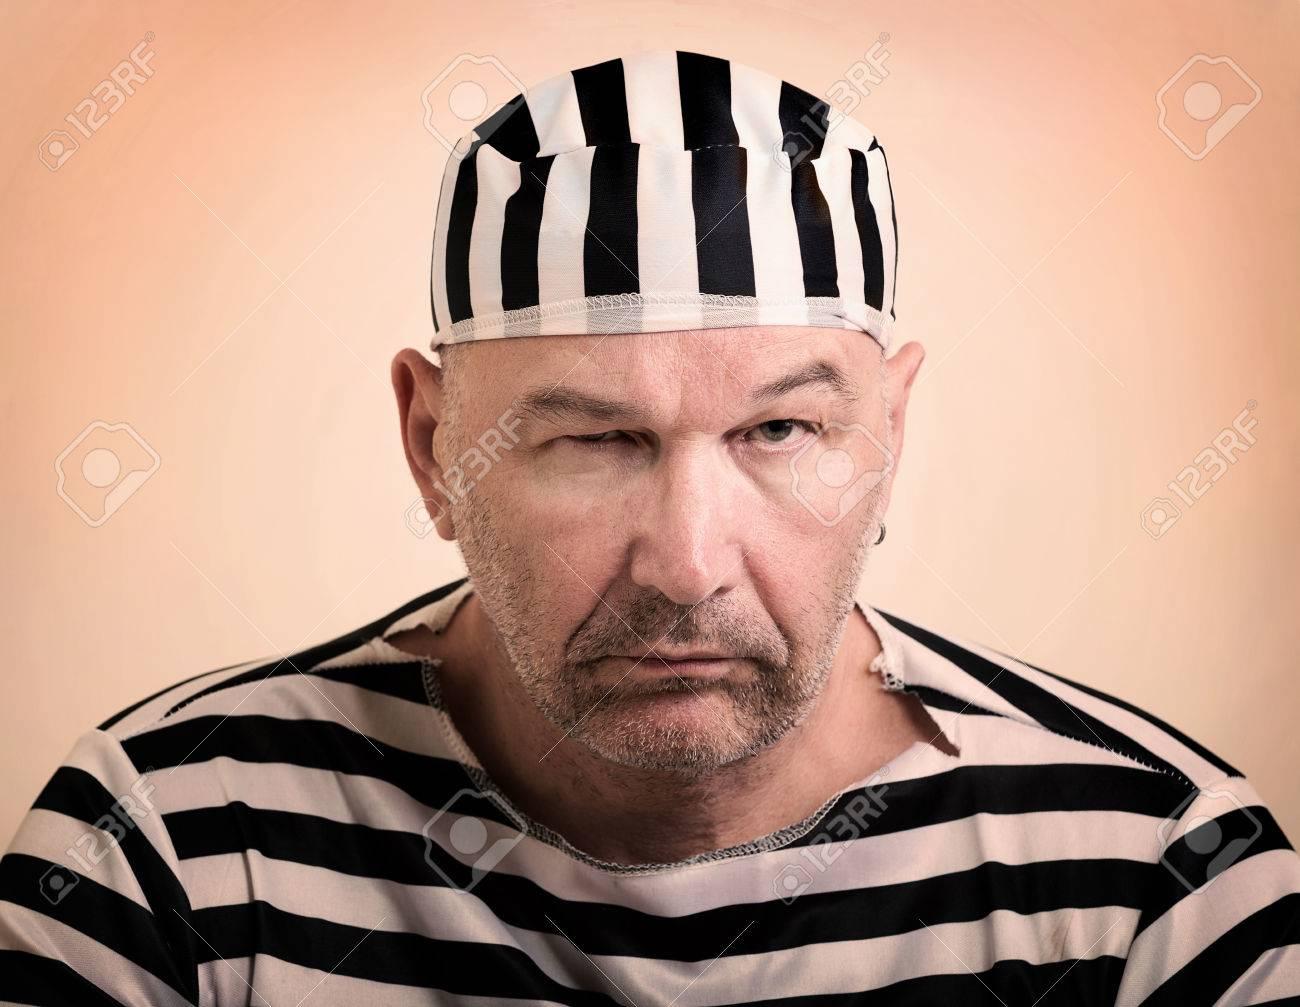 portrait of a man prisoner in prison garb Stock Photo - 27469055